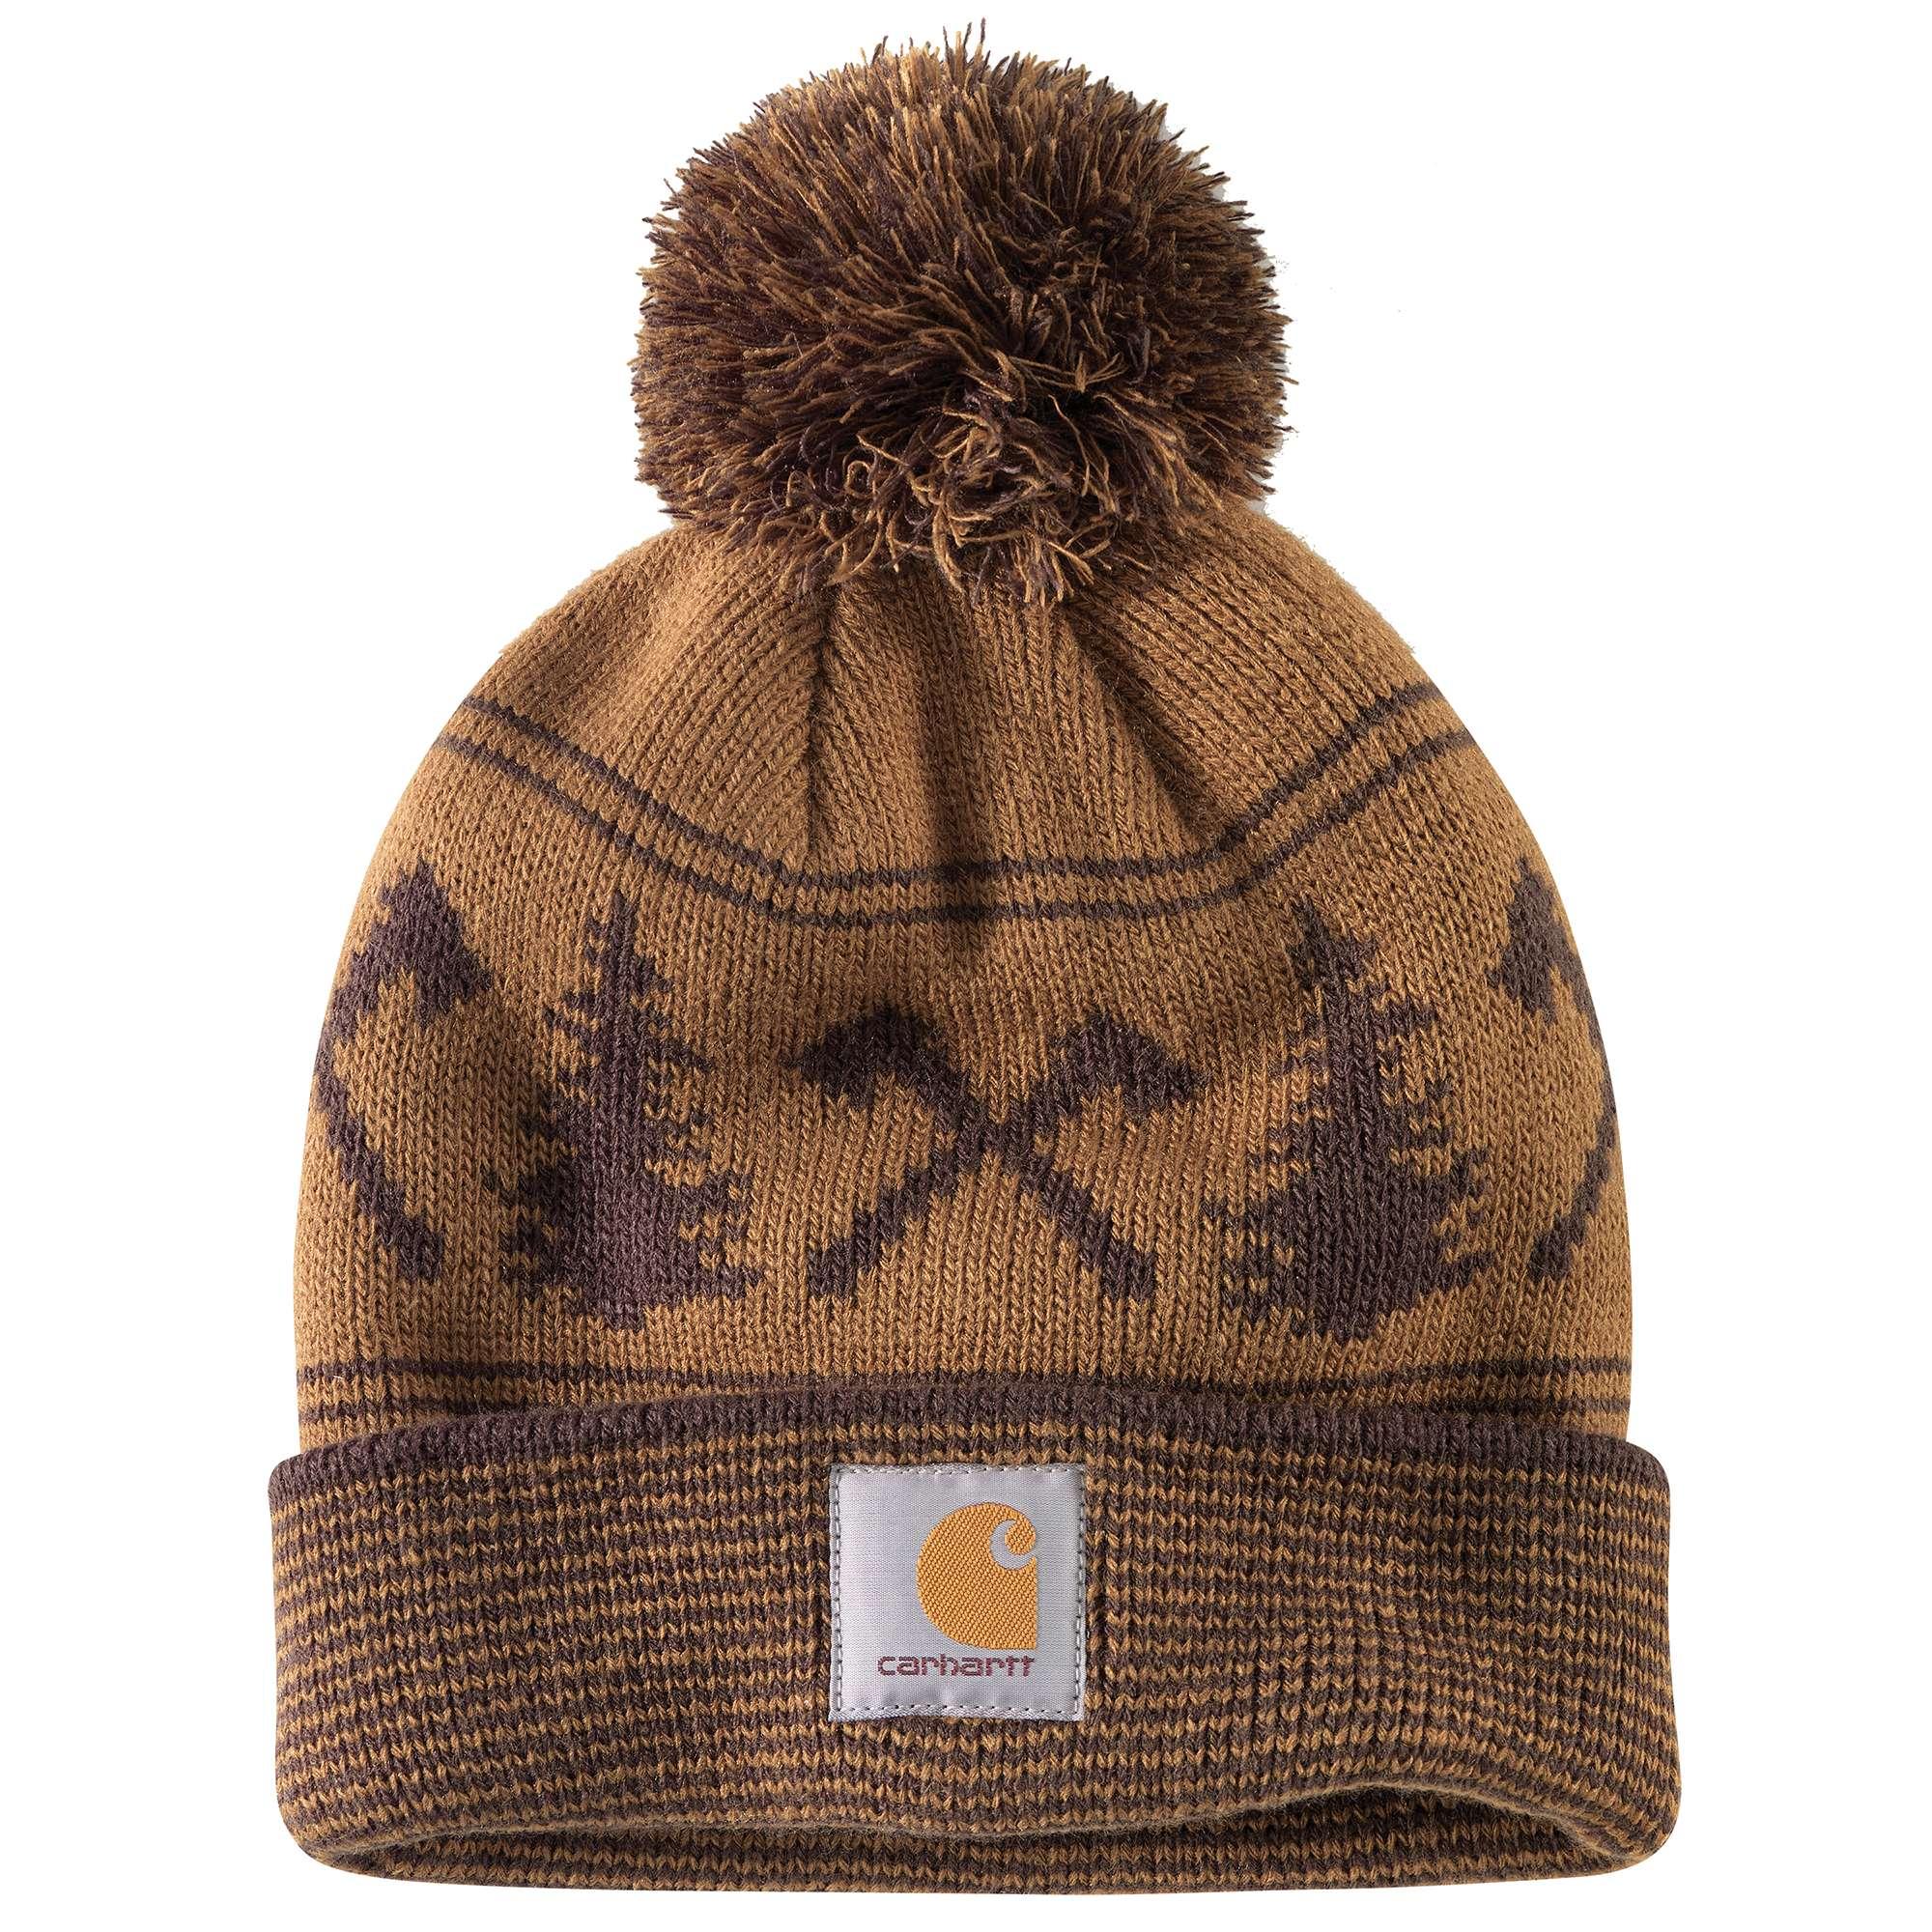 Carhartt Searchlight Hat